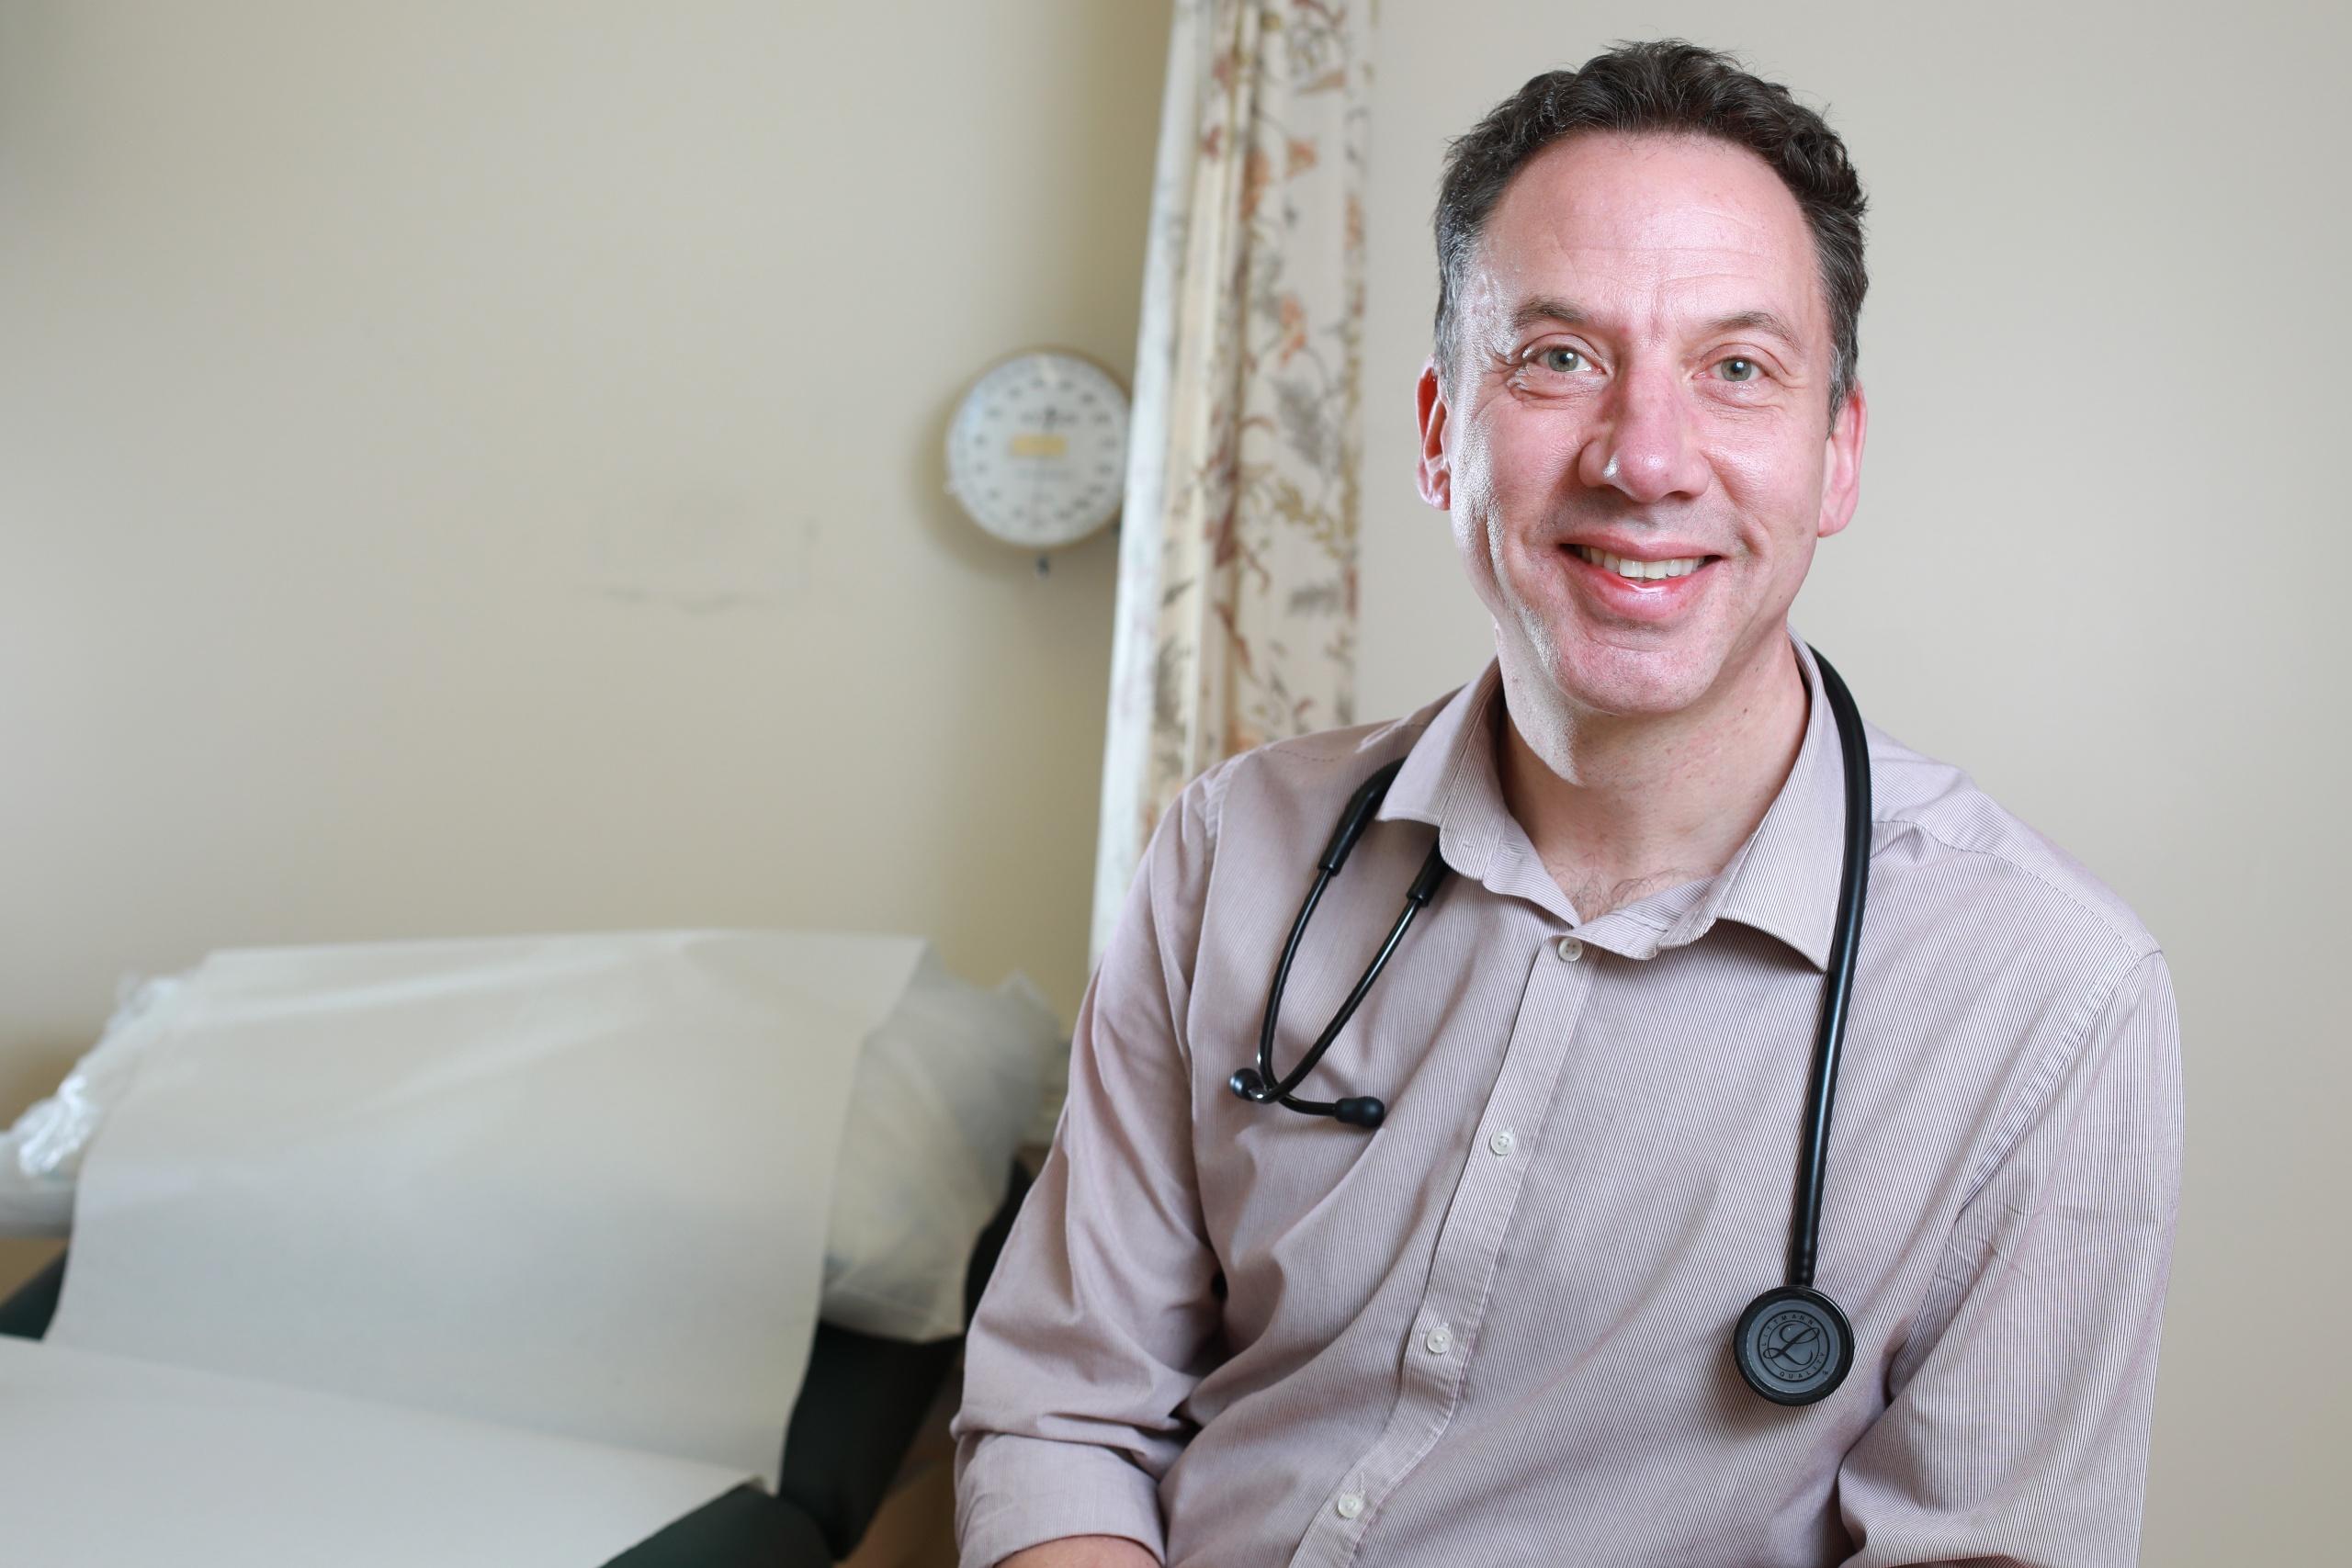 Image shows Professor Andrew Ustianowski